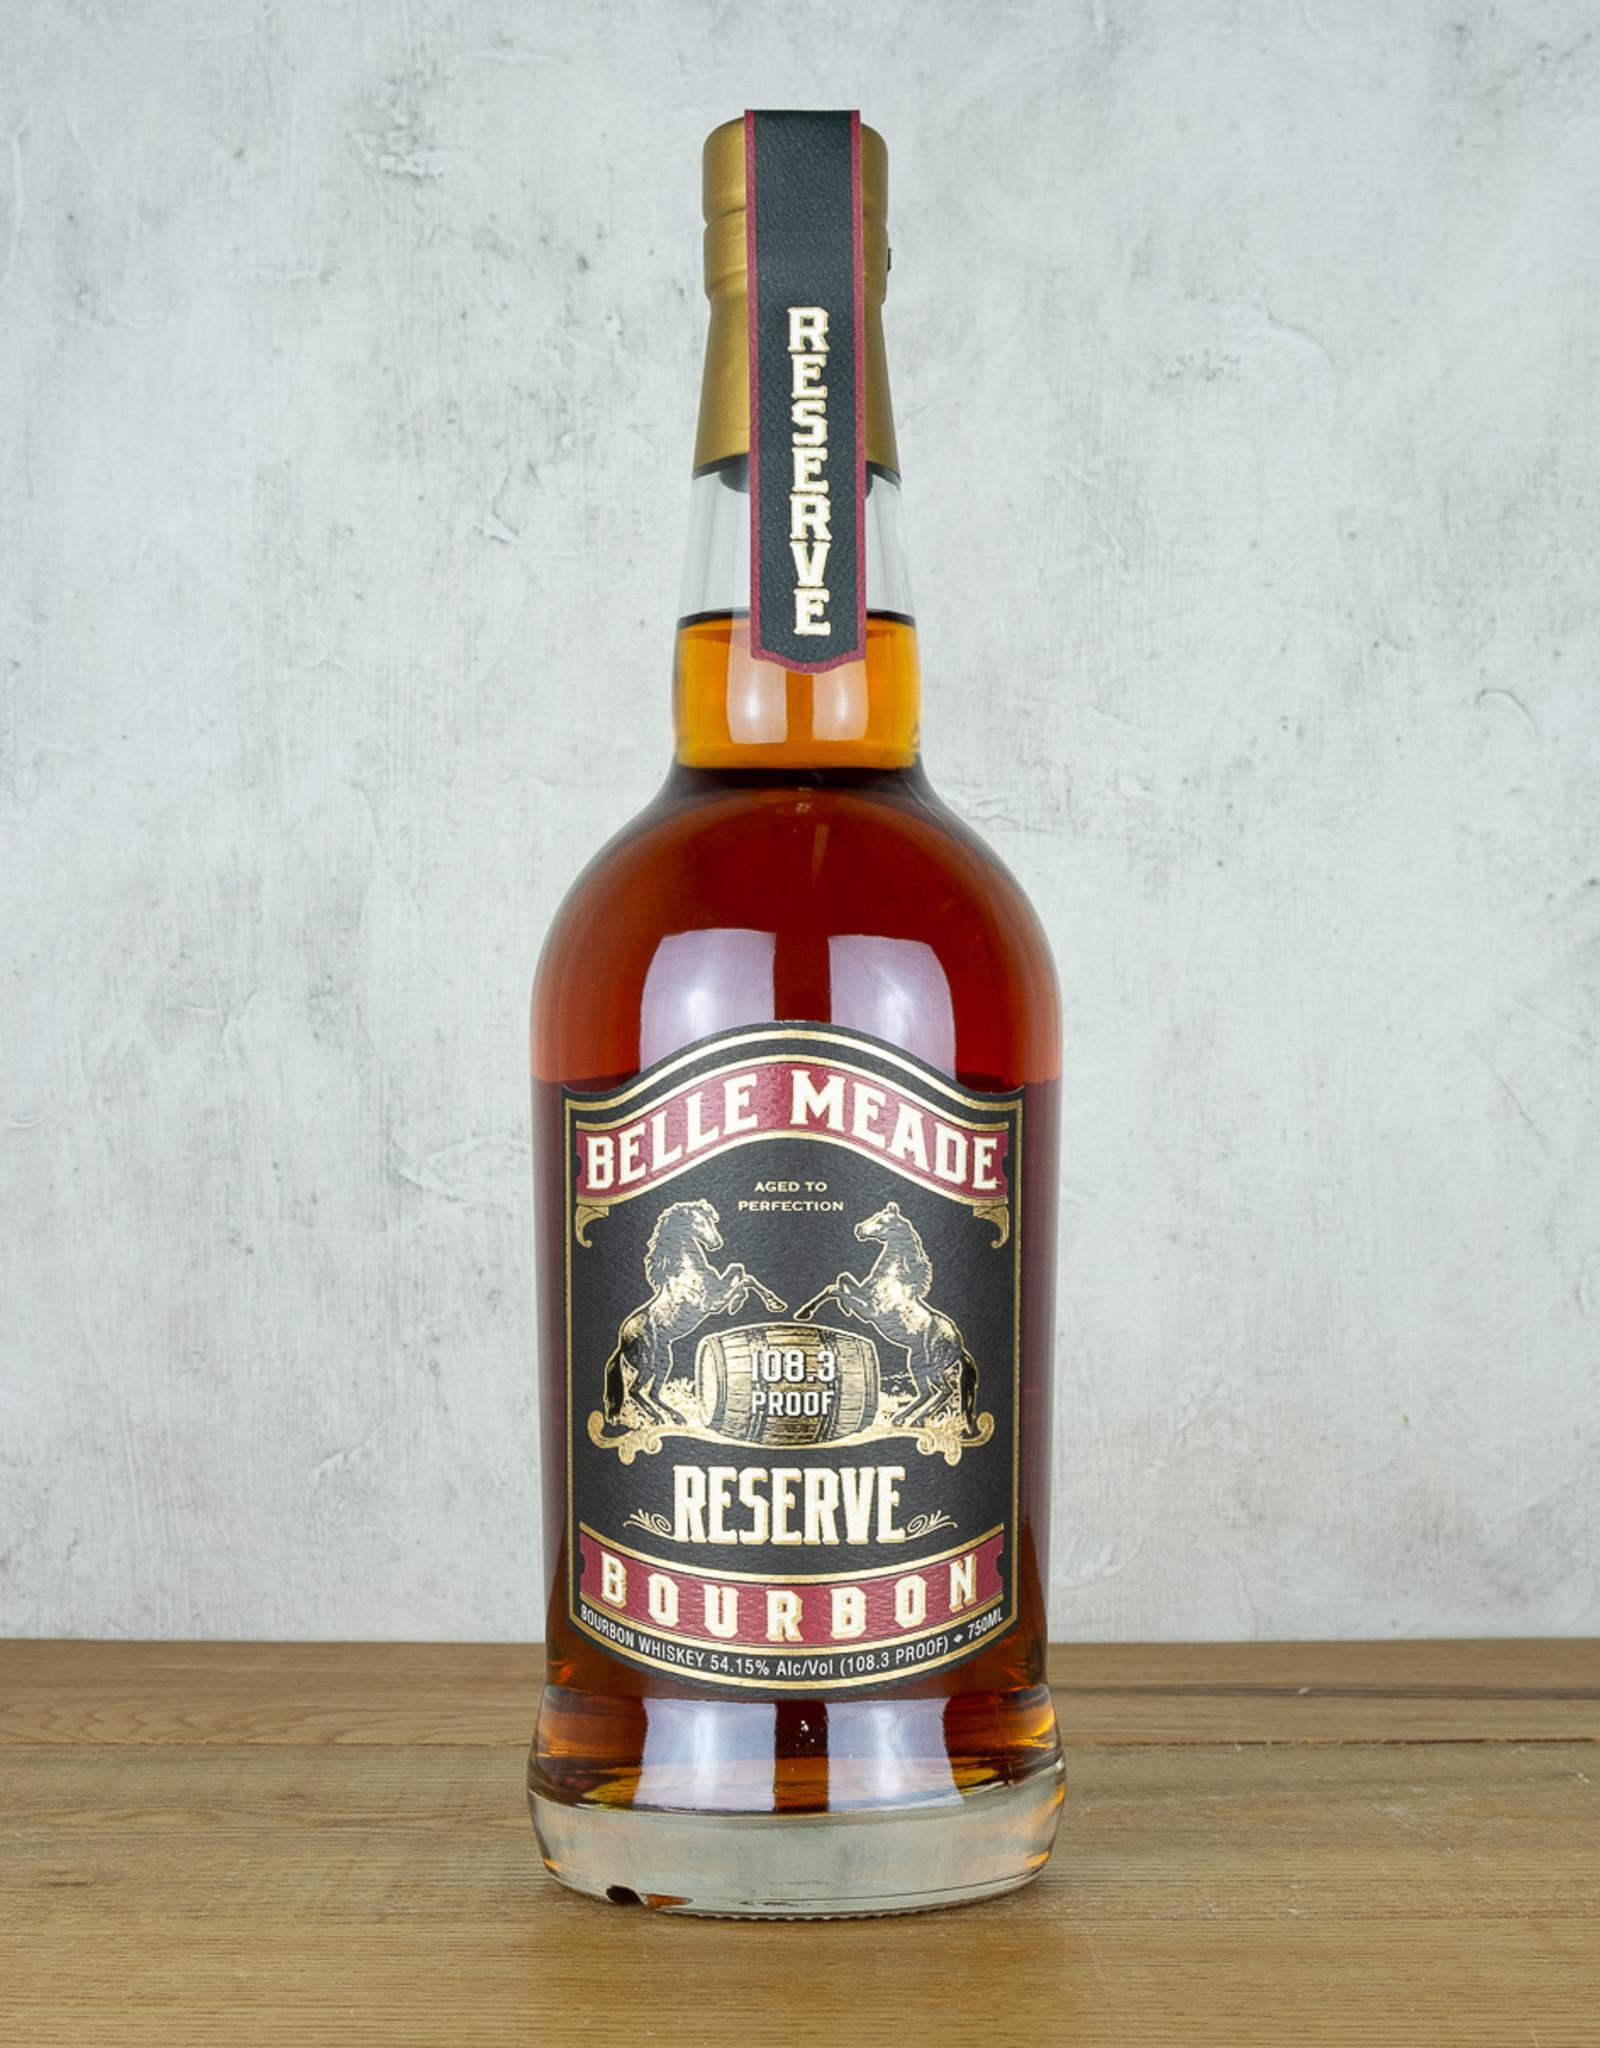 Belle Meade Bourbon Reserve